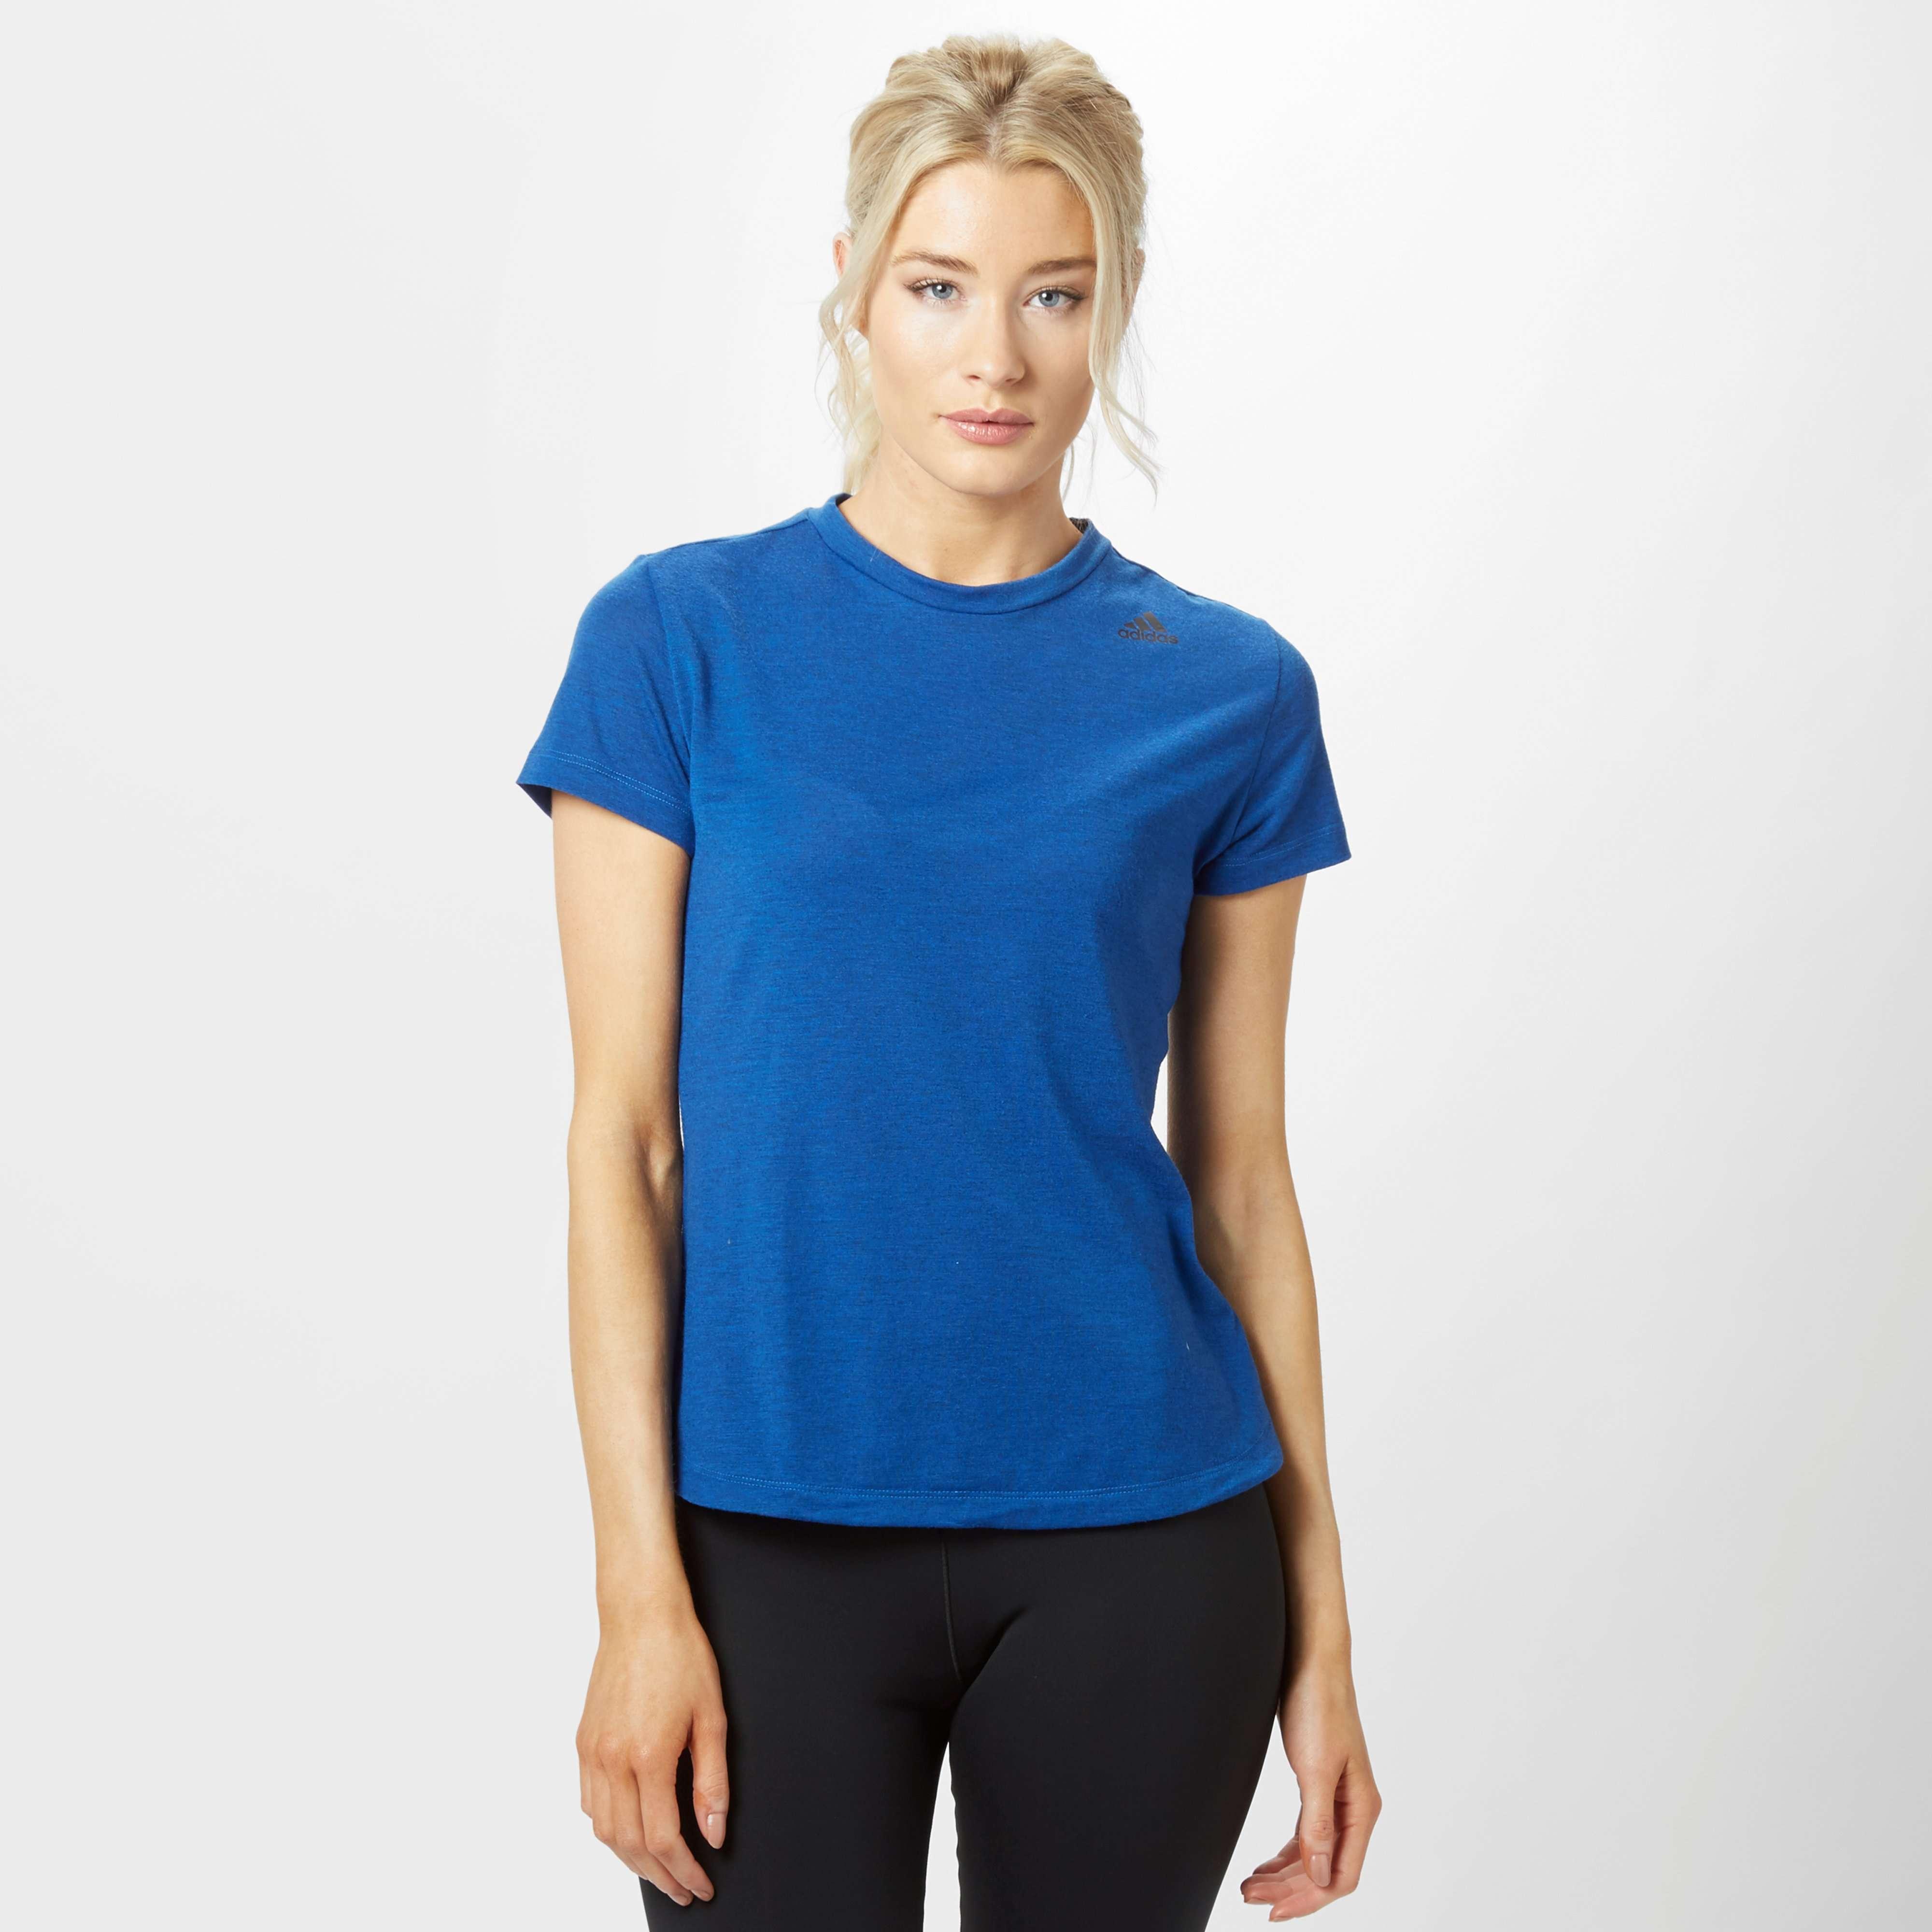 ADIDAS Women'sPrime T-Shirt